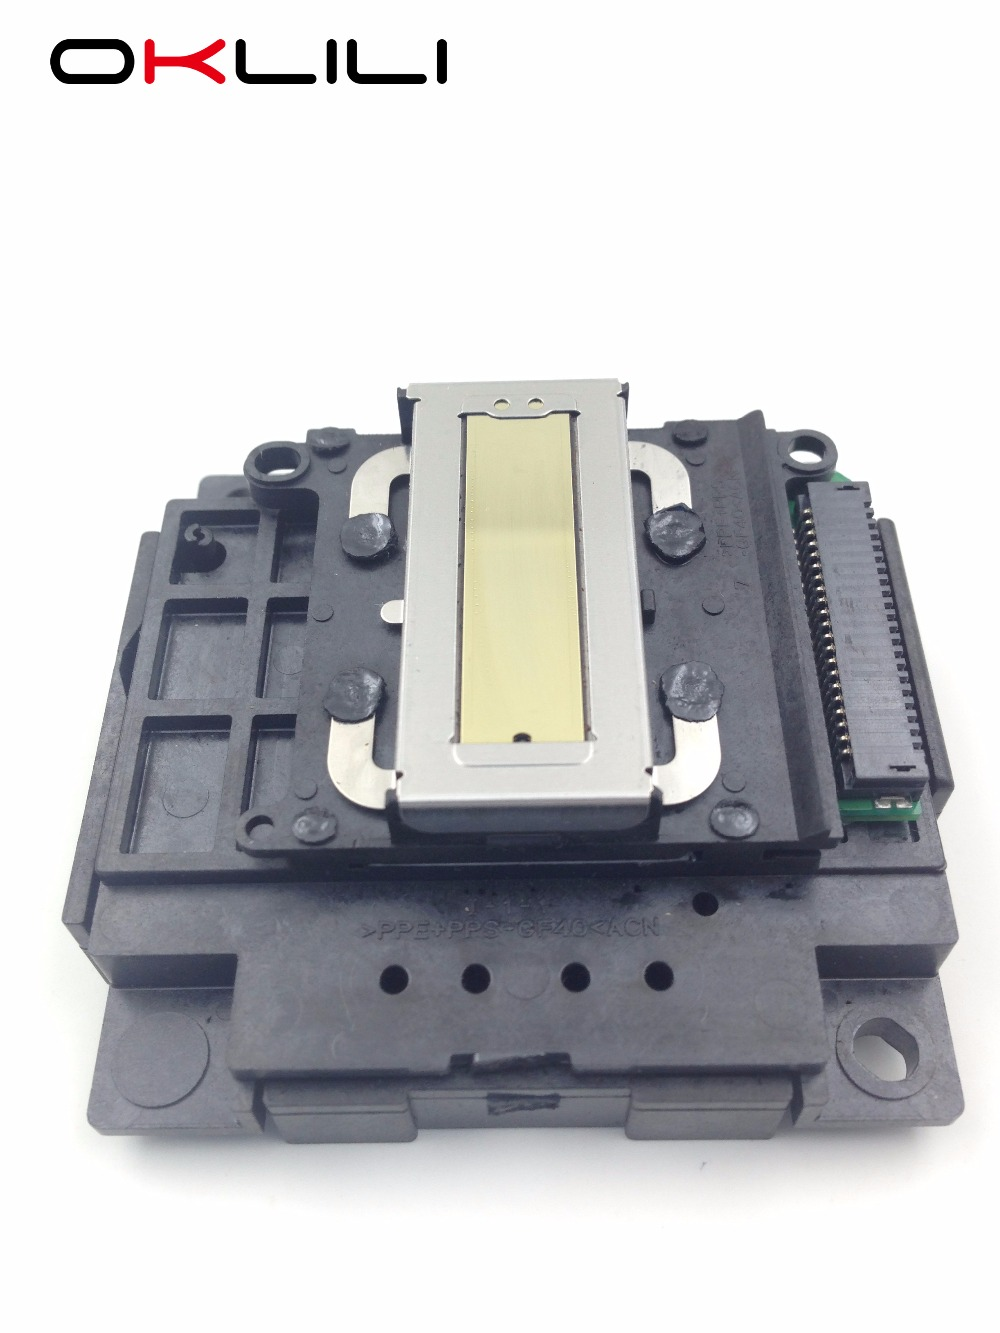 FA04000 FA04010 Tisková hlava tiskové hlavy pro tiskárnu Epson WF-2010 WF-2510 WF-2520 WF-2530 WF-2540 ME401 ME303 WF2010 WF2510